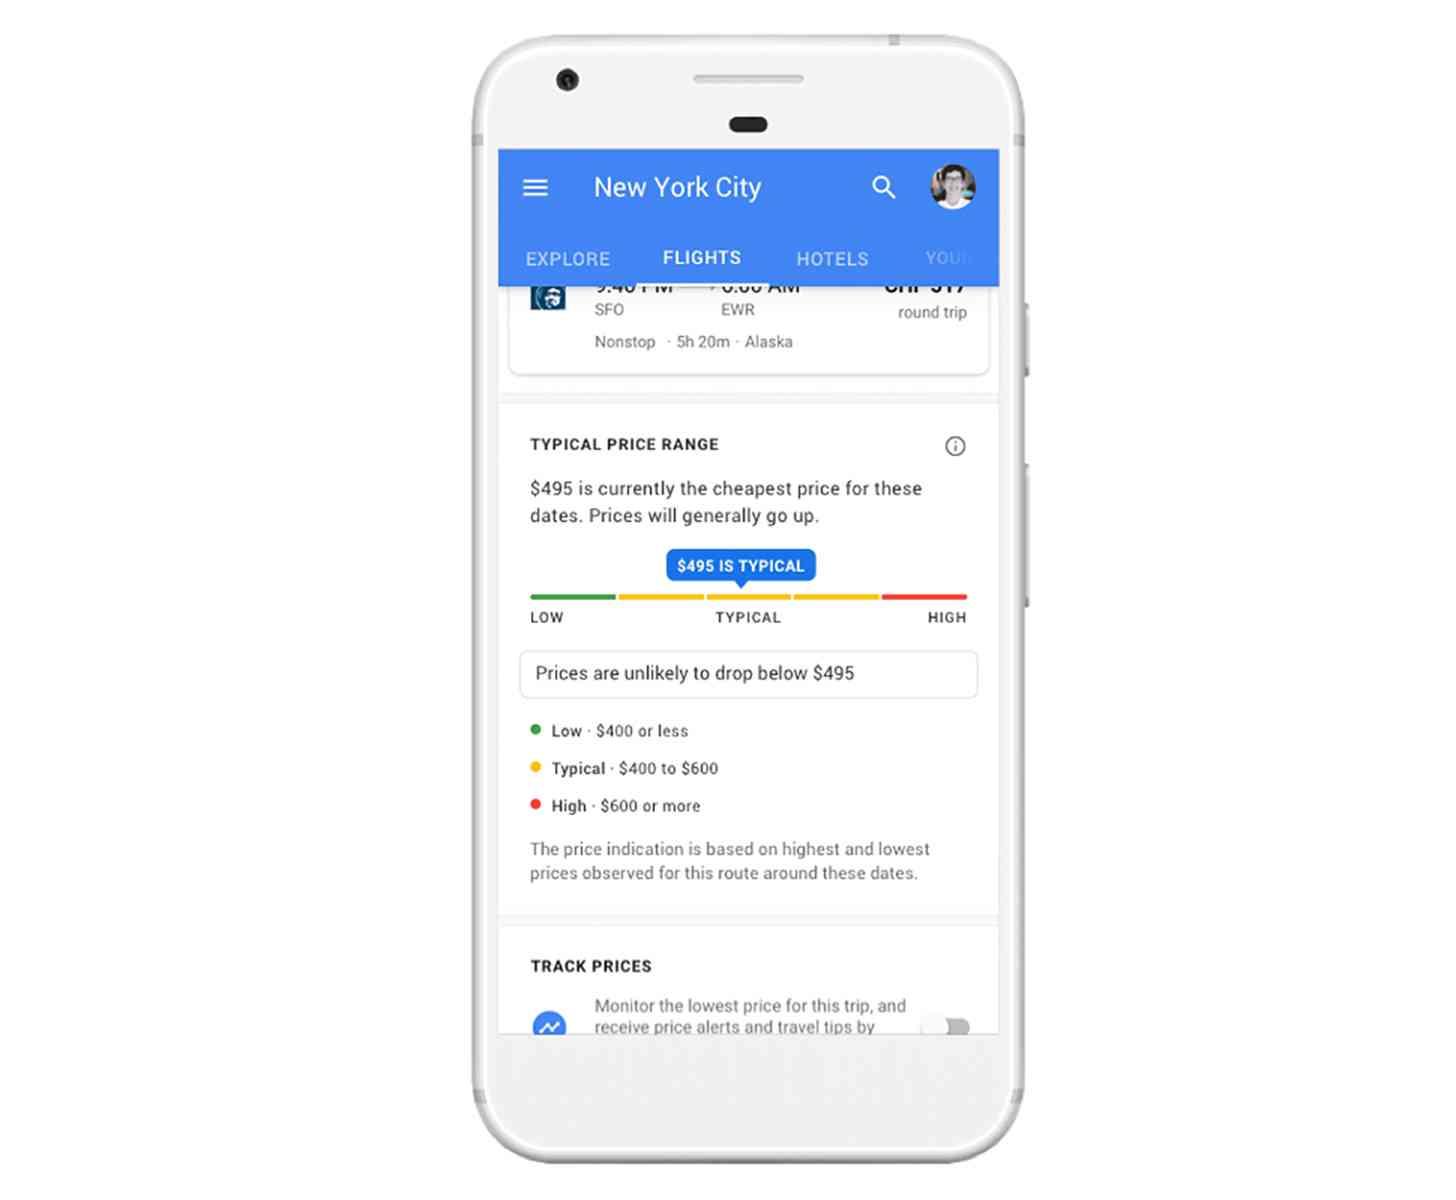 Google Flights Christmas New Year's pricing